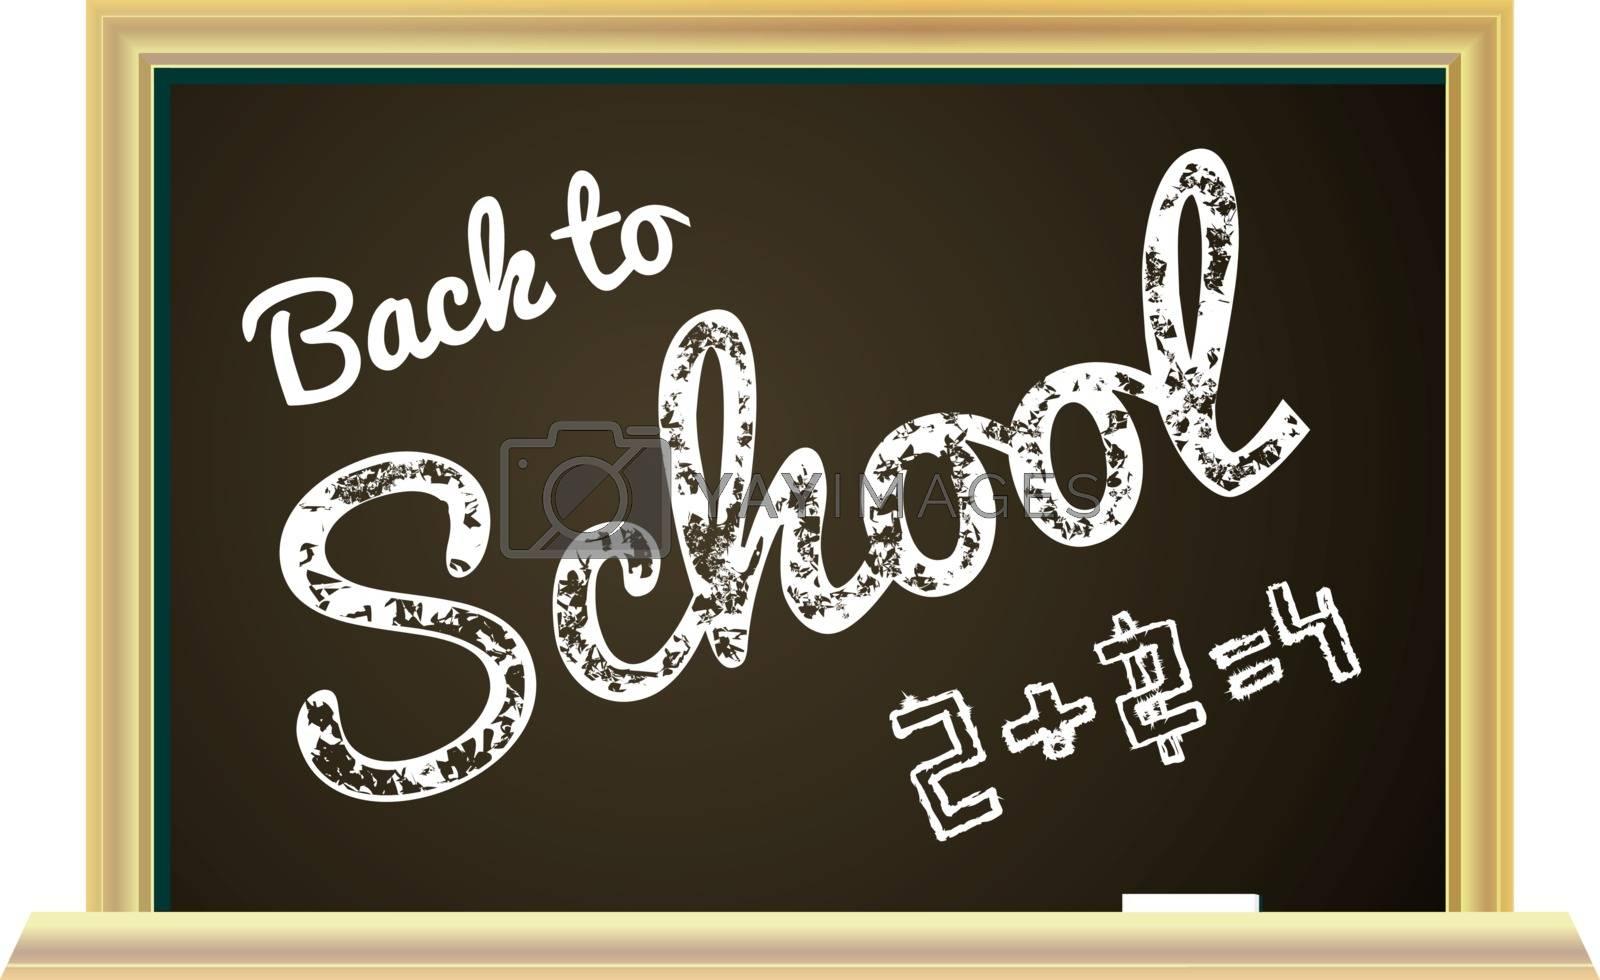 Back to school Illustration on a chalkboard background. Vector illustration